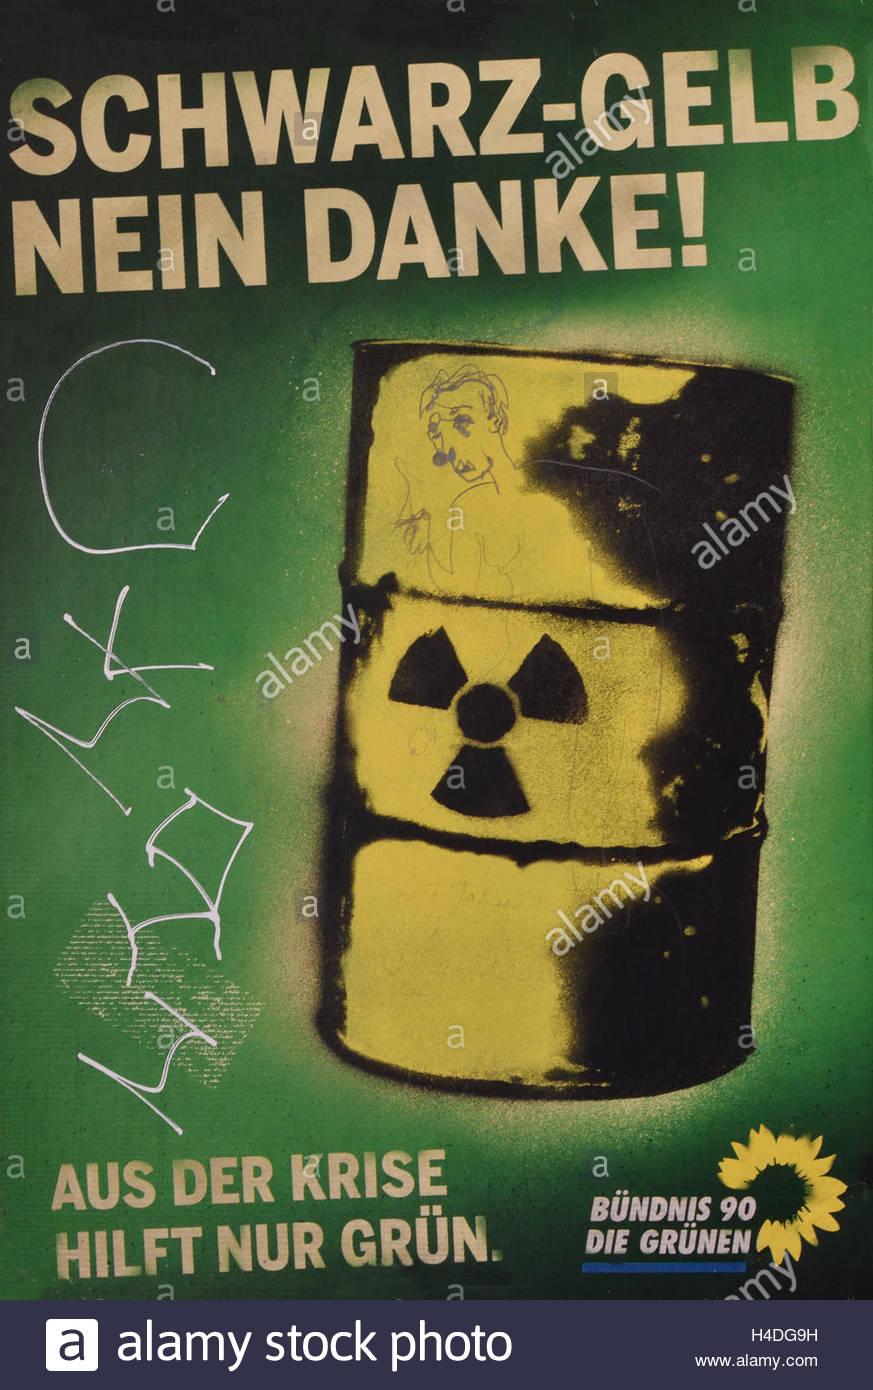 """Schwarz-Gelb nein danke"" – Themenplakat Bündnis 90/Die Grünen 2009 - 'Black-yellow no thank you' - Stock Image"